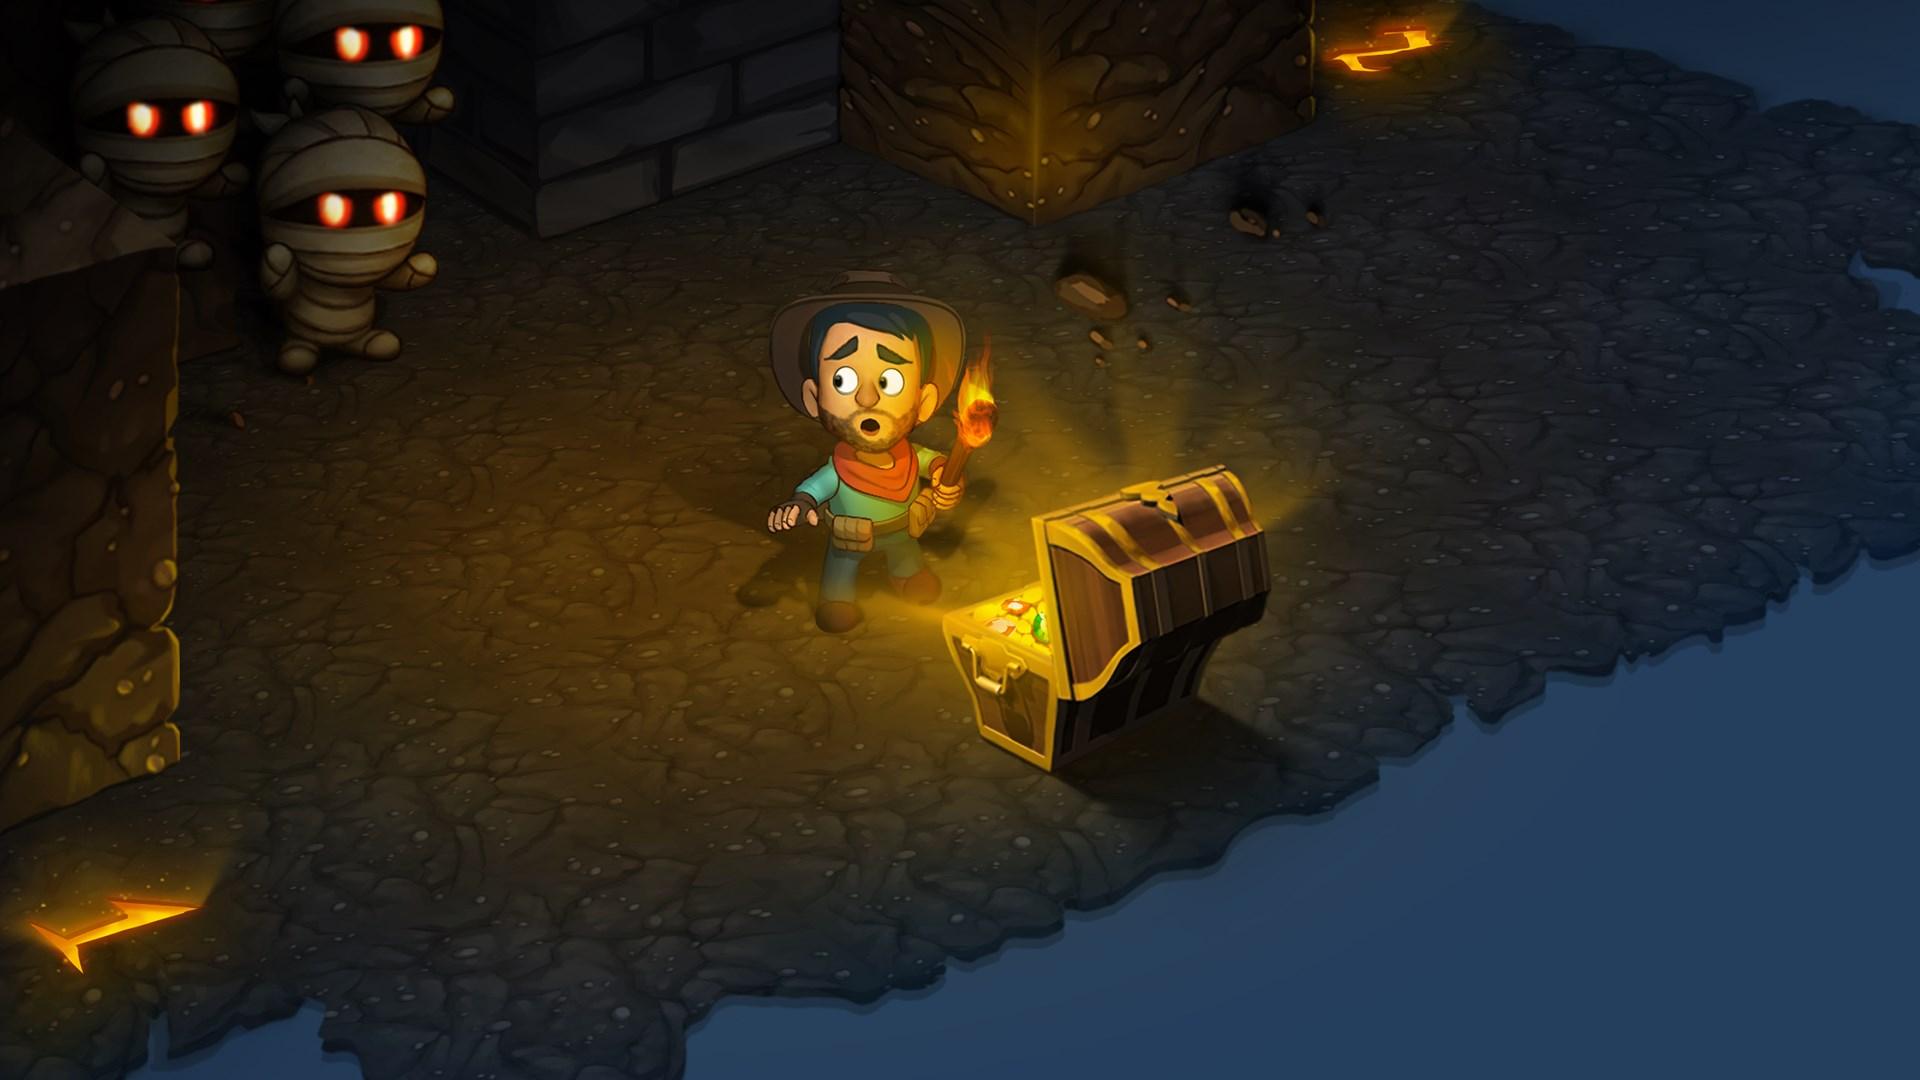 book of treasures game free download